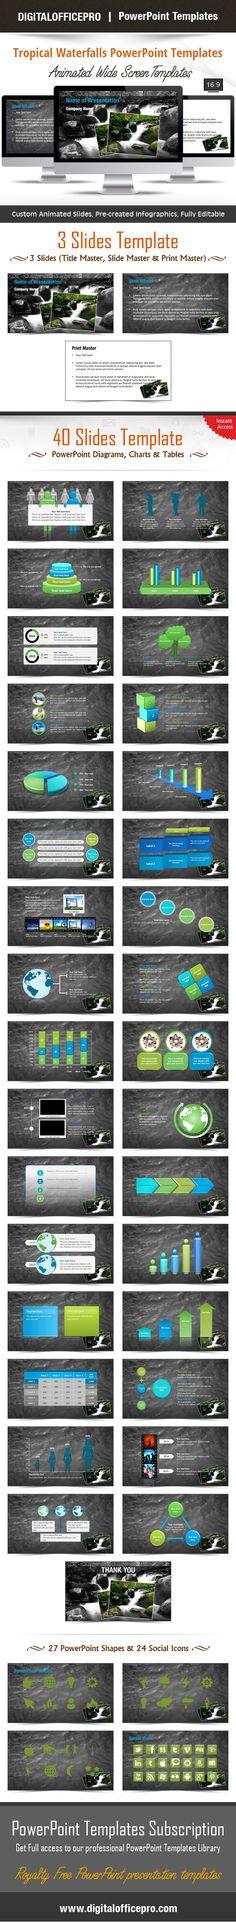 Dell PowerEdge R620 Server 2x E5-2650 200GHz 8-Core 128GB RAM 2x - tf2 spreadsheet